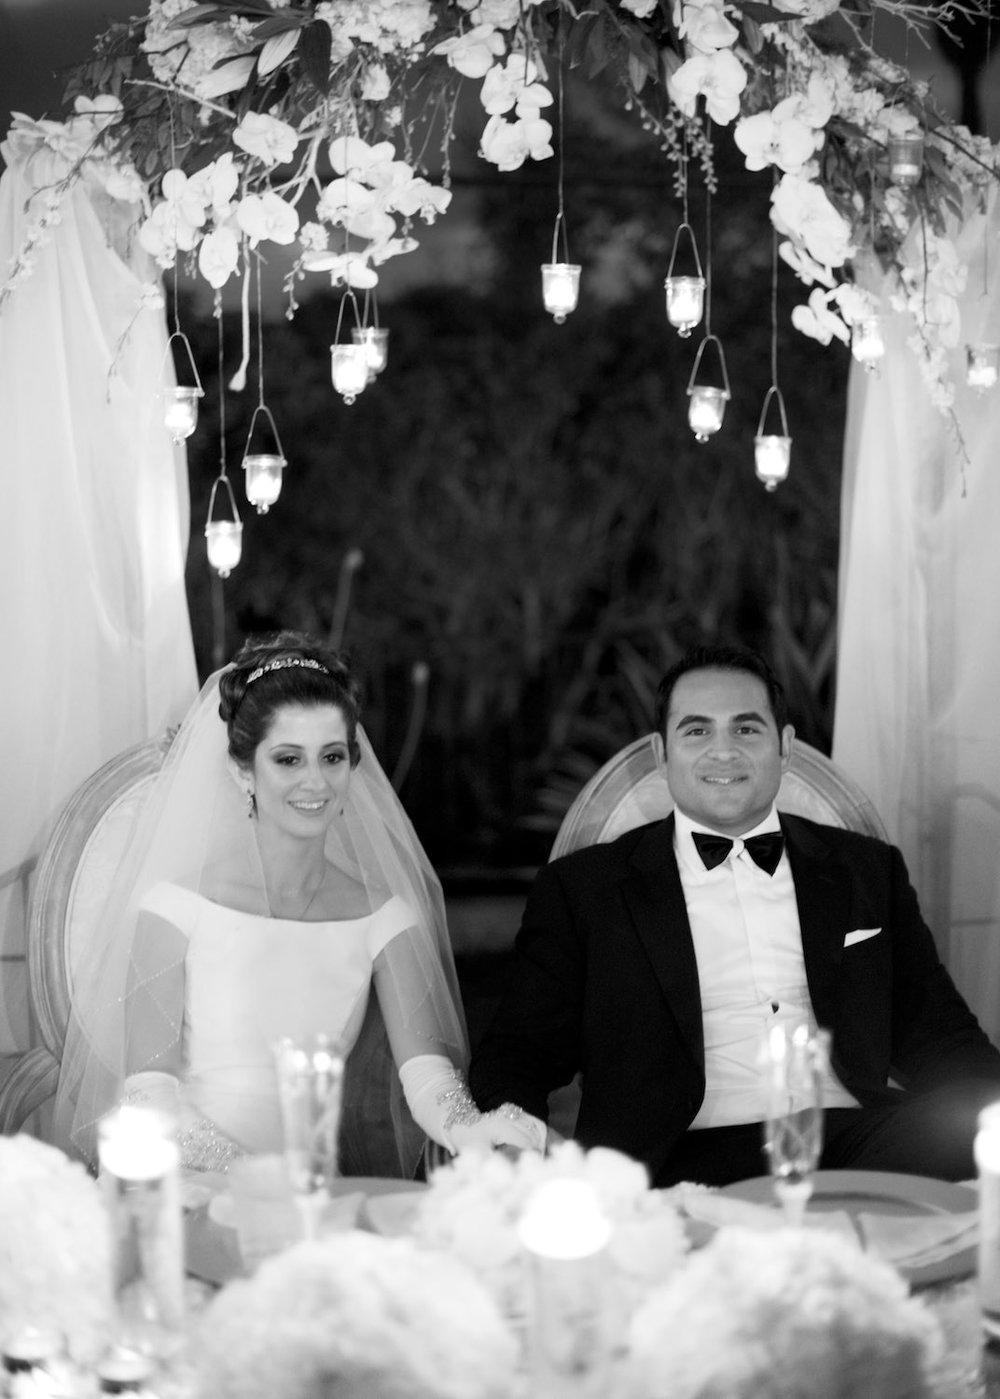 la-valencia-wedding-michal-pfeil-45.jpg